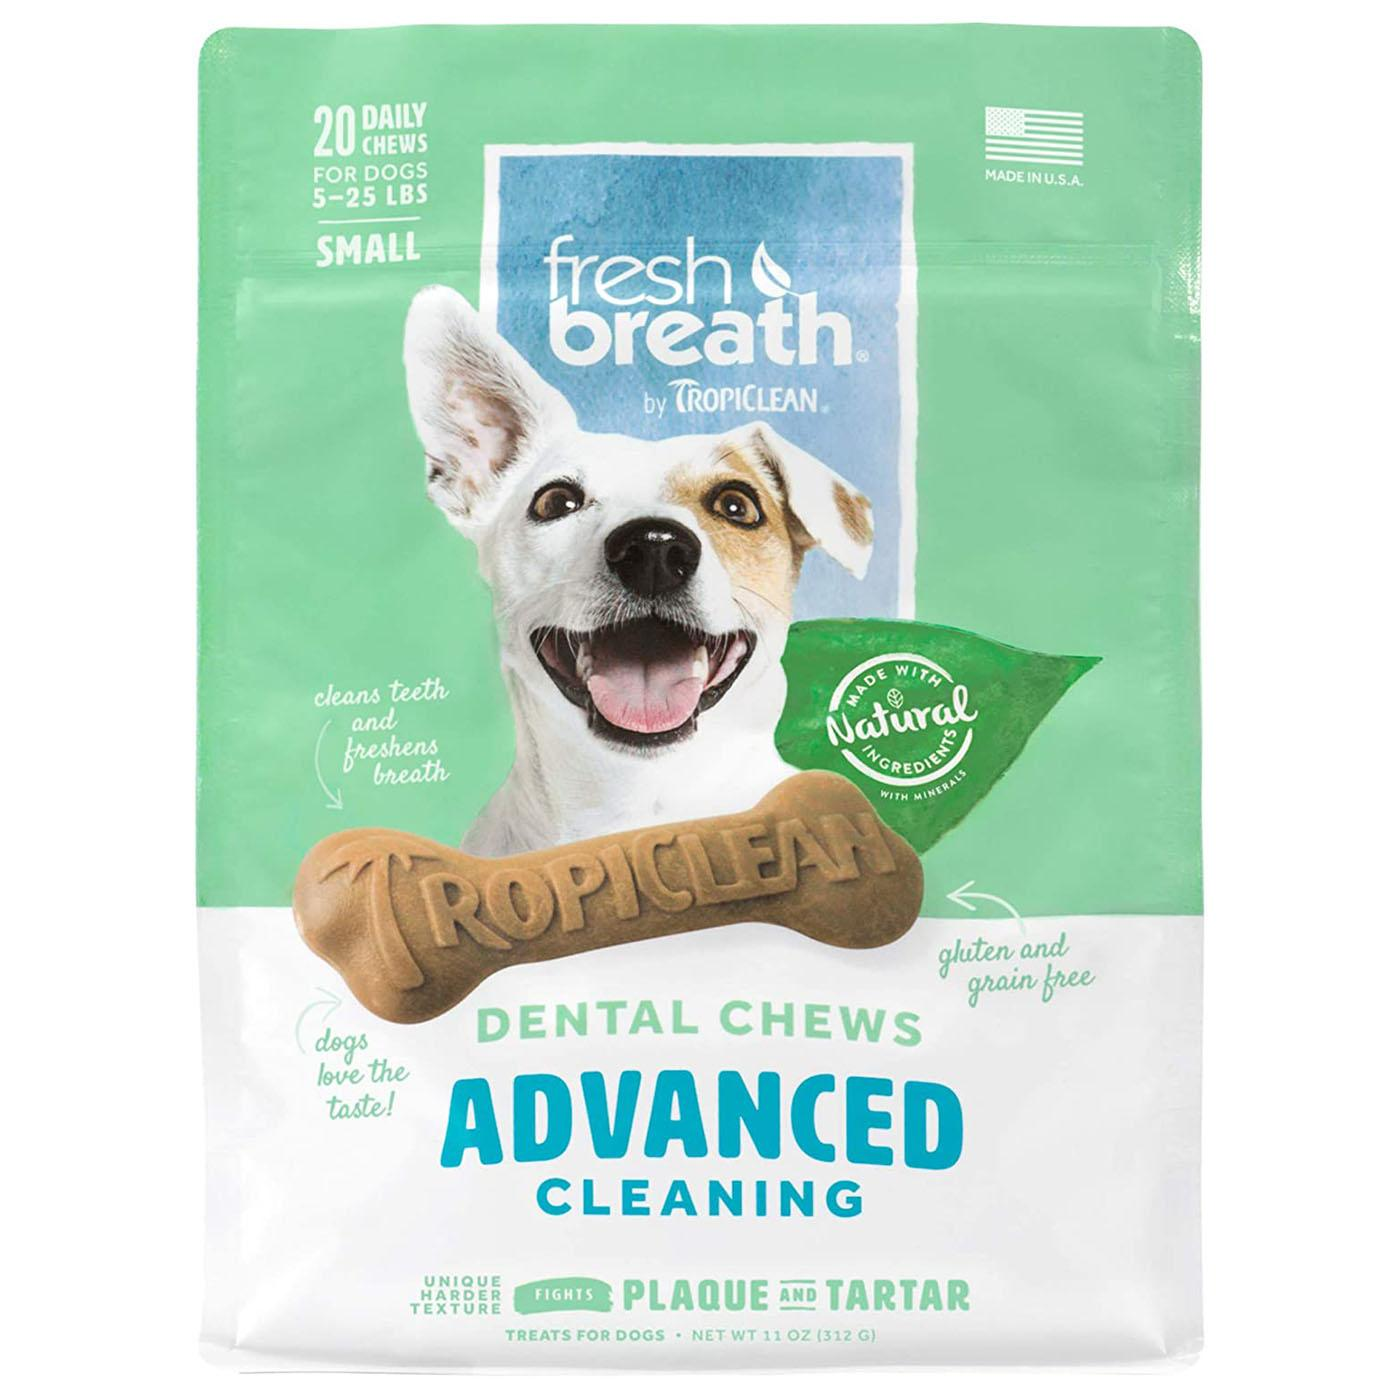 TropiClean Fresh Breath Dental Chews Advanced Cleaning Dog Treats